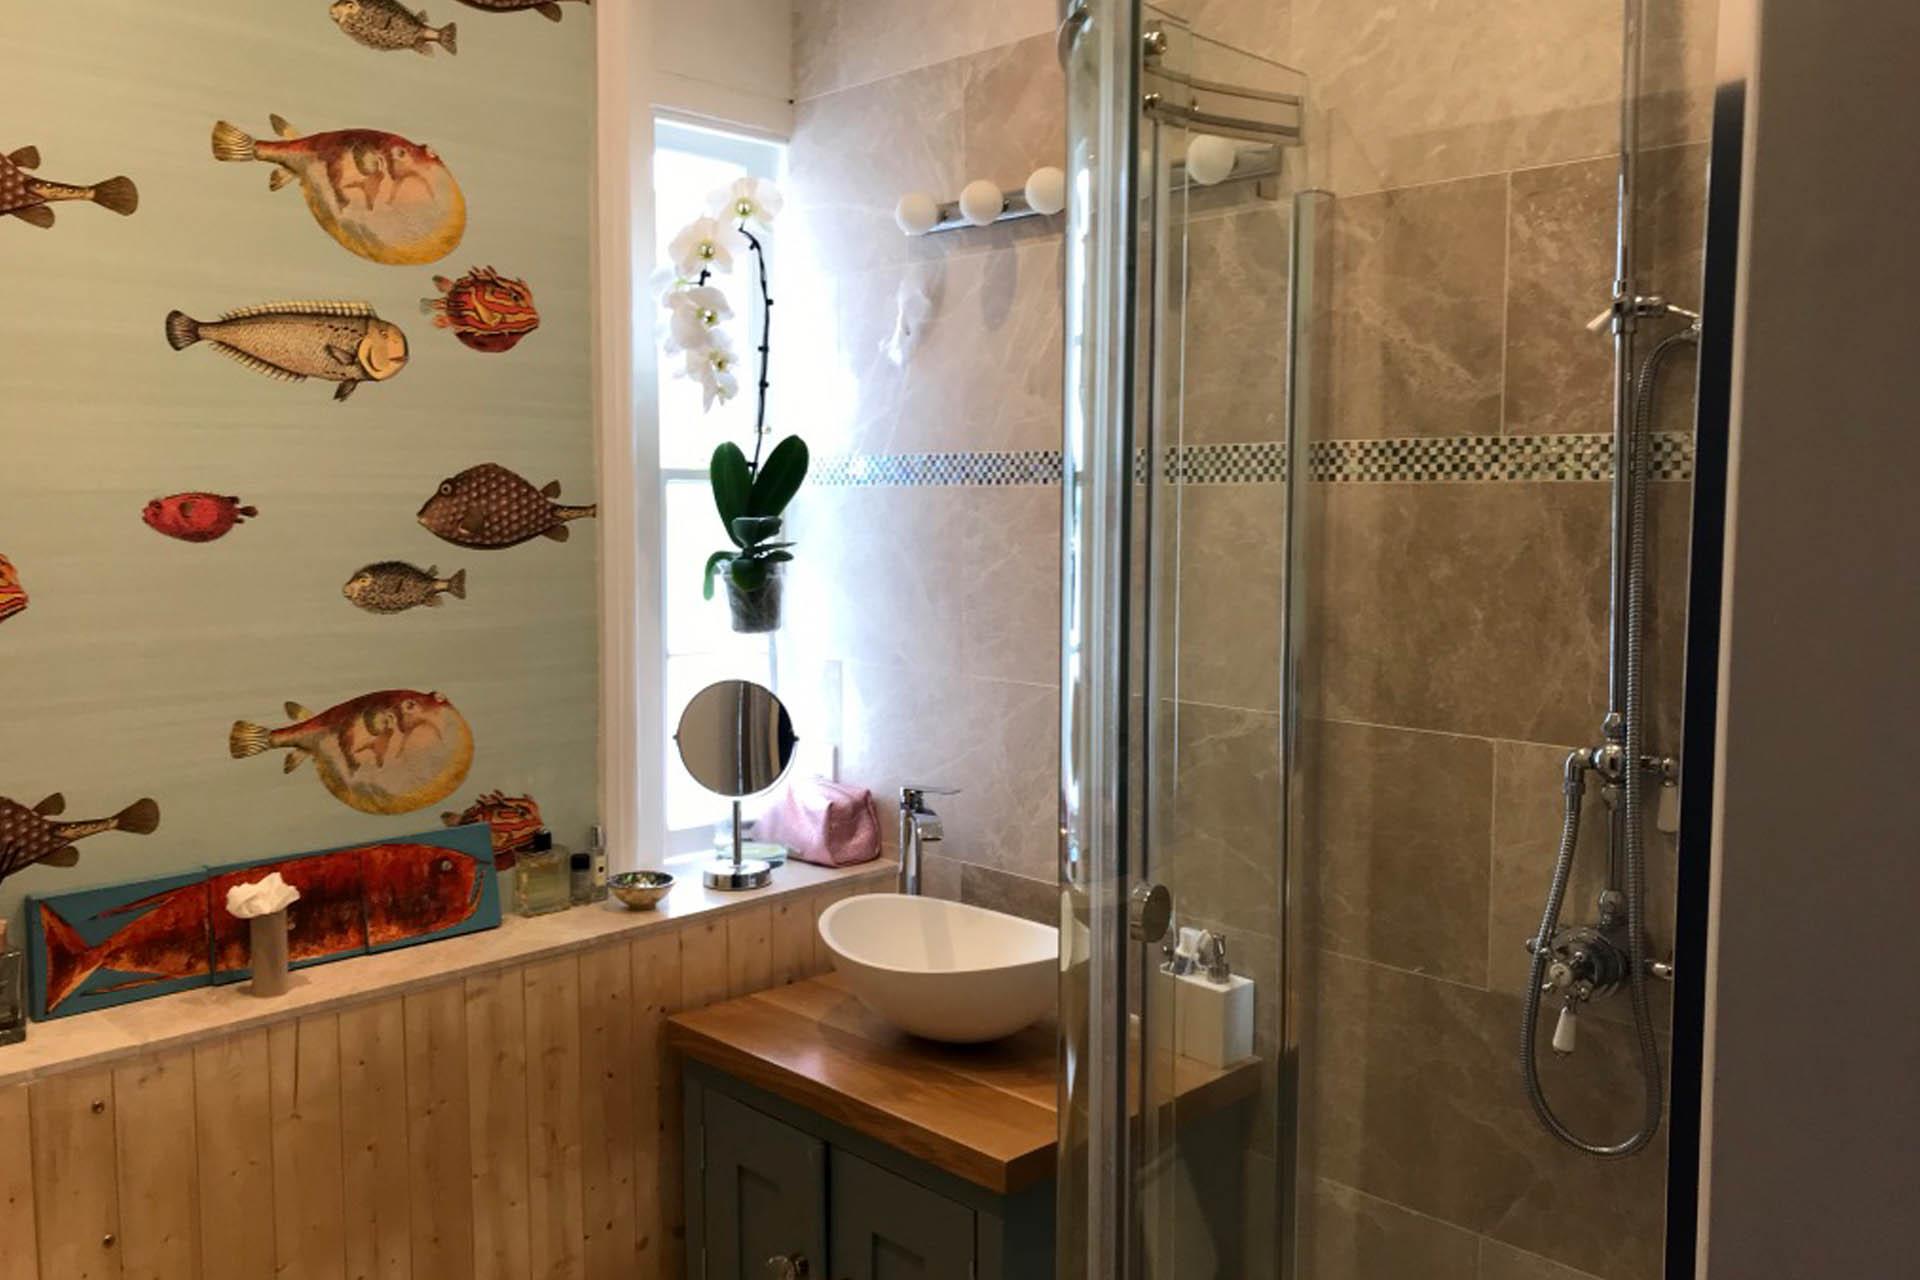 KIlburn NW6 new bathroom installed